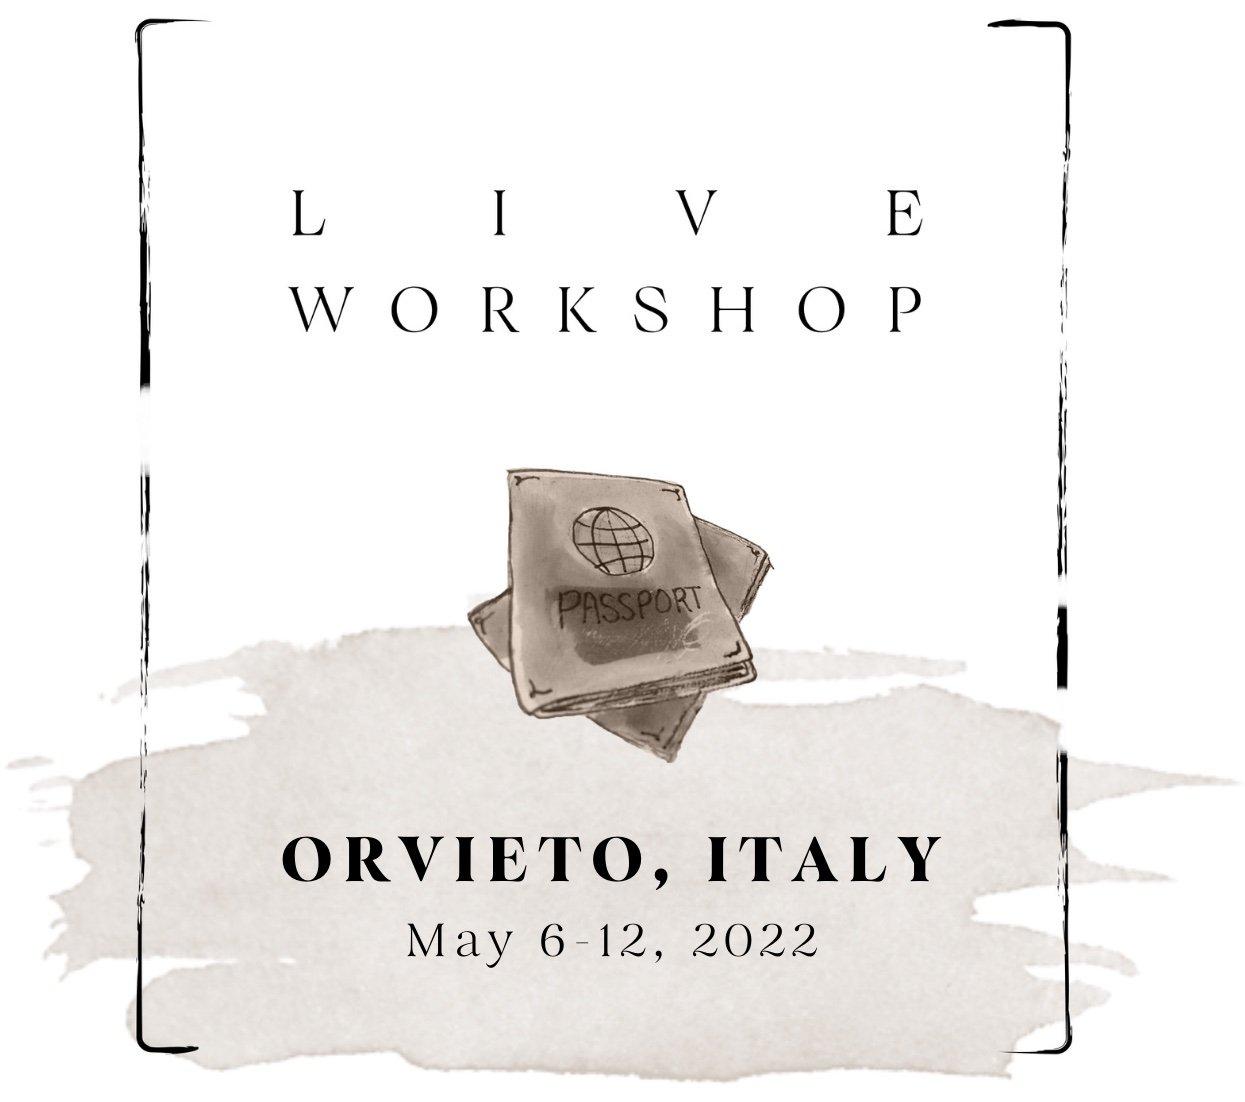 Orvieto-Uber-Image Crop